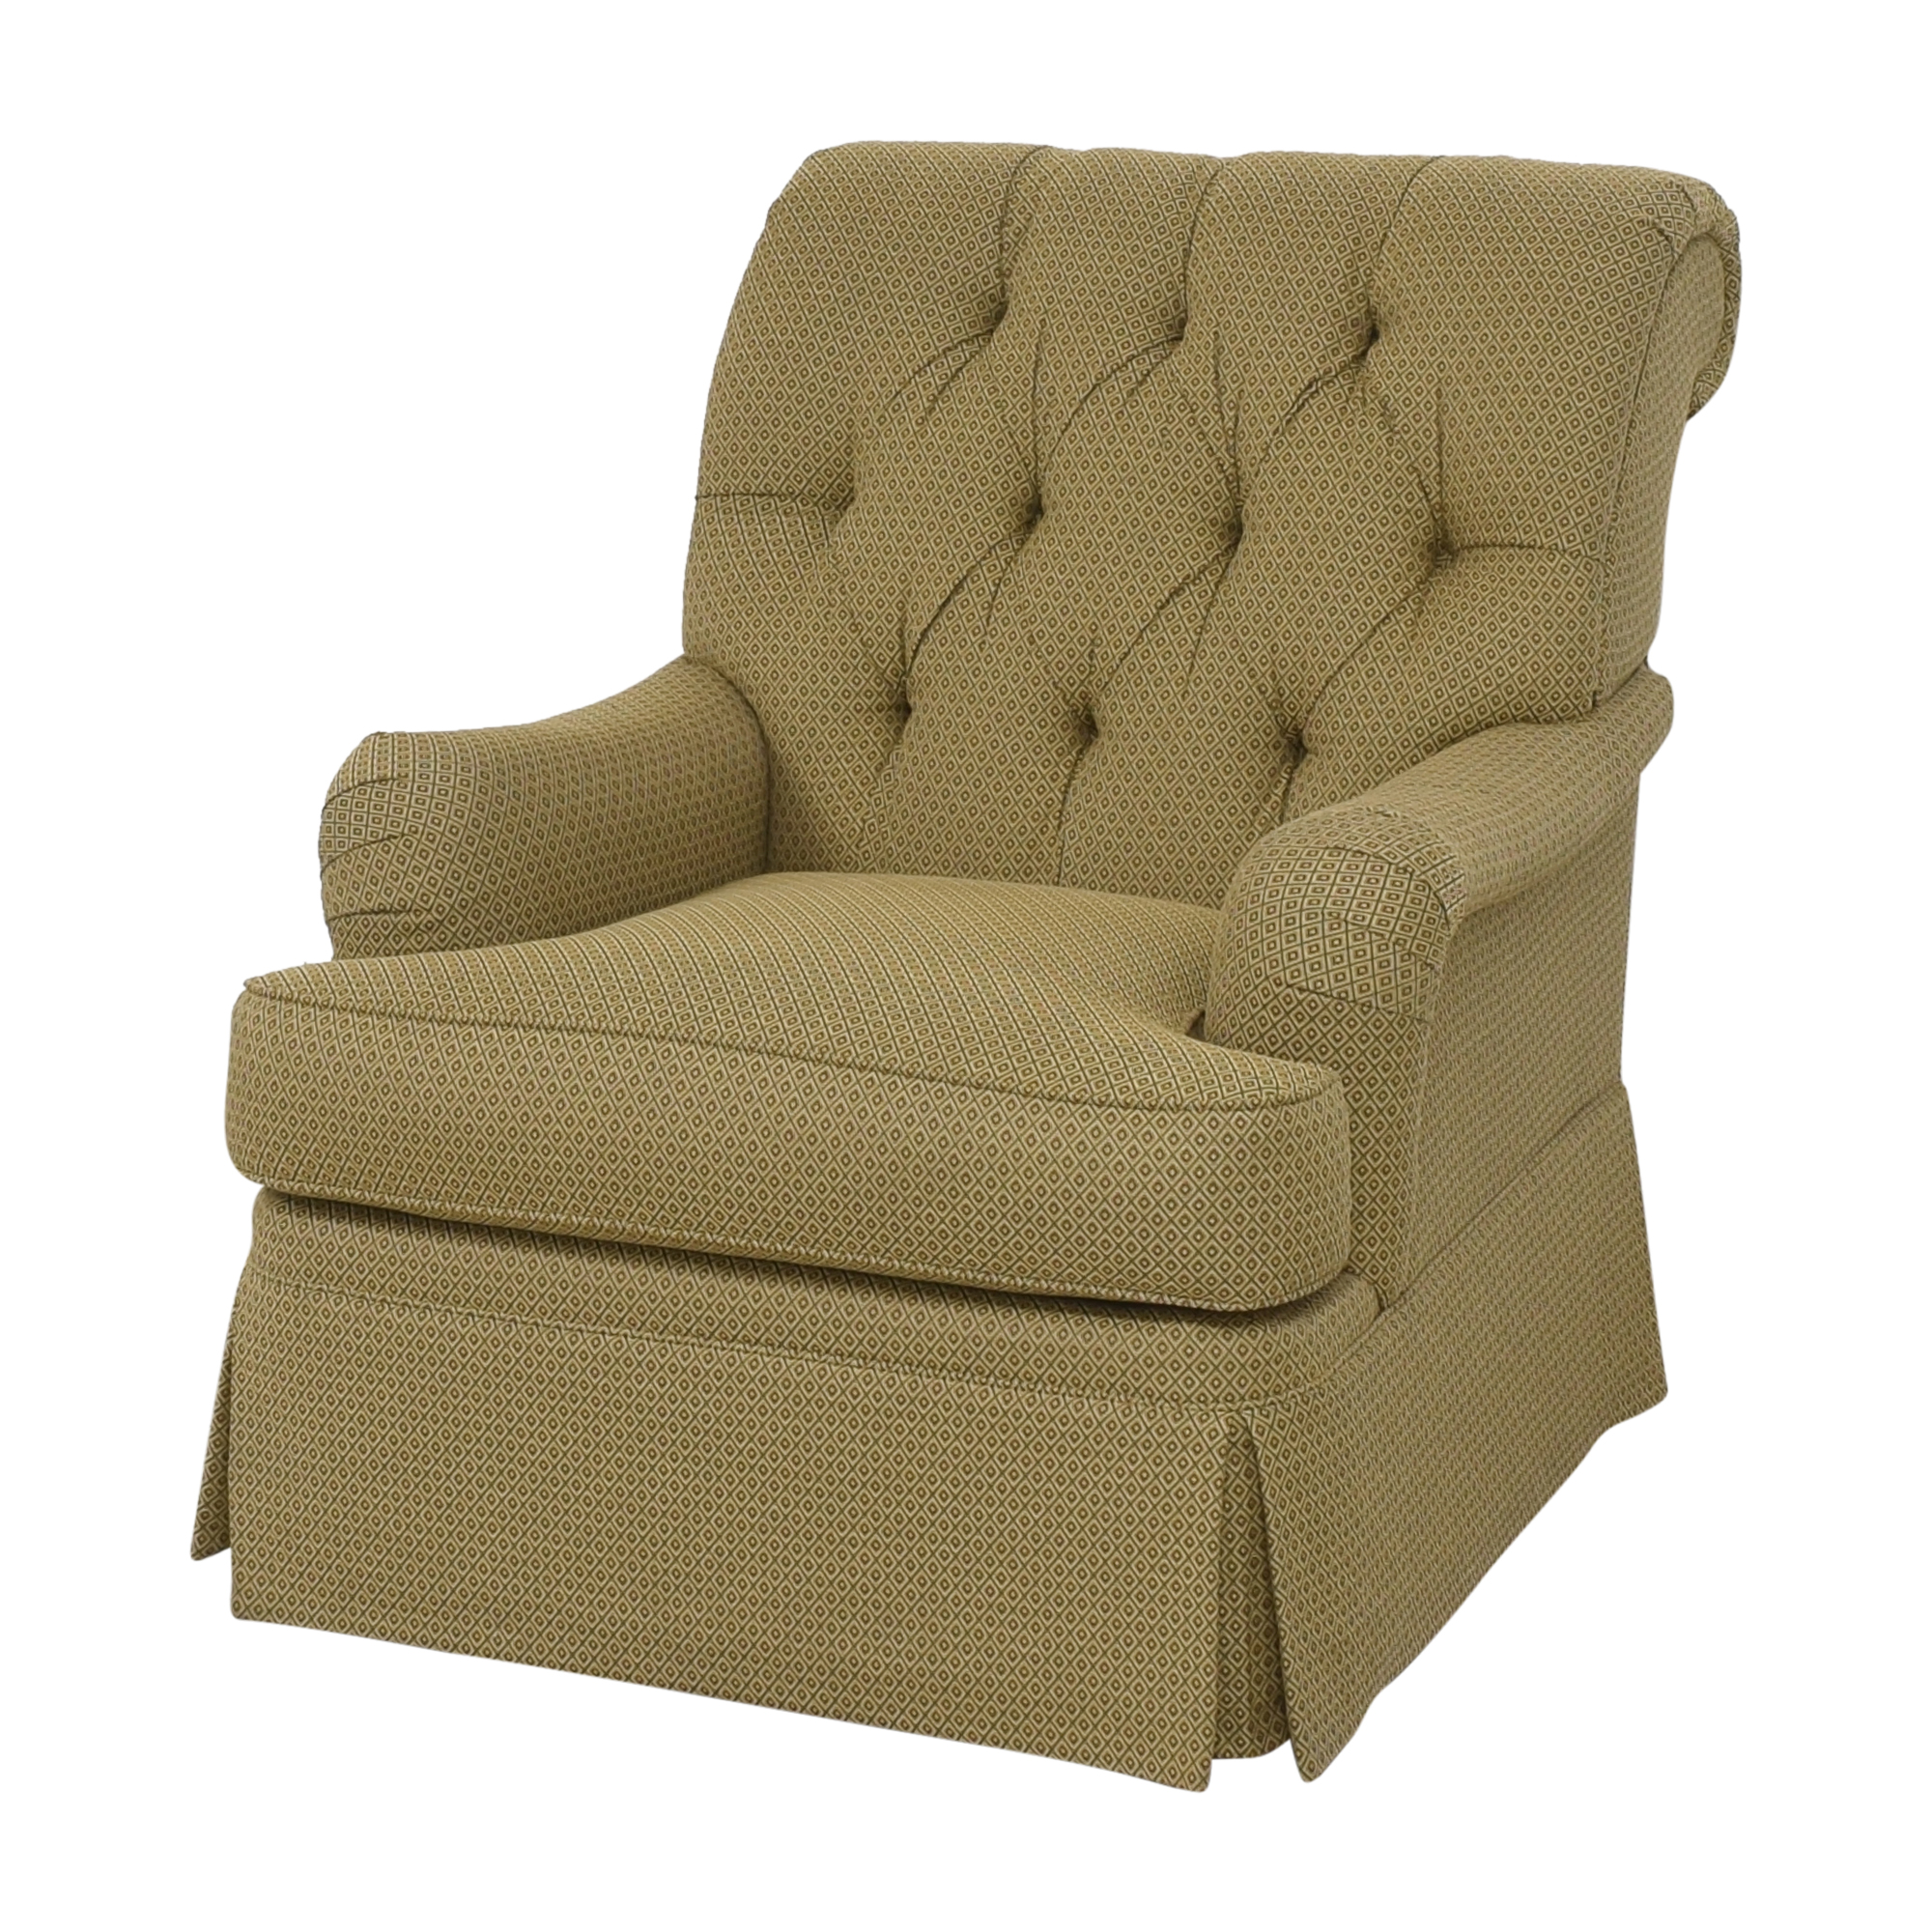 Henredon Furniture Henredon Furniture Scroll Back Accent Chair Chairs